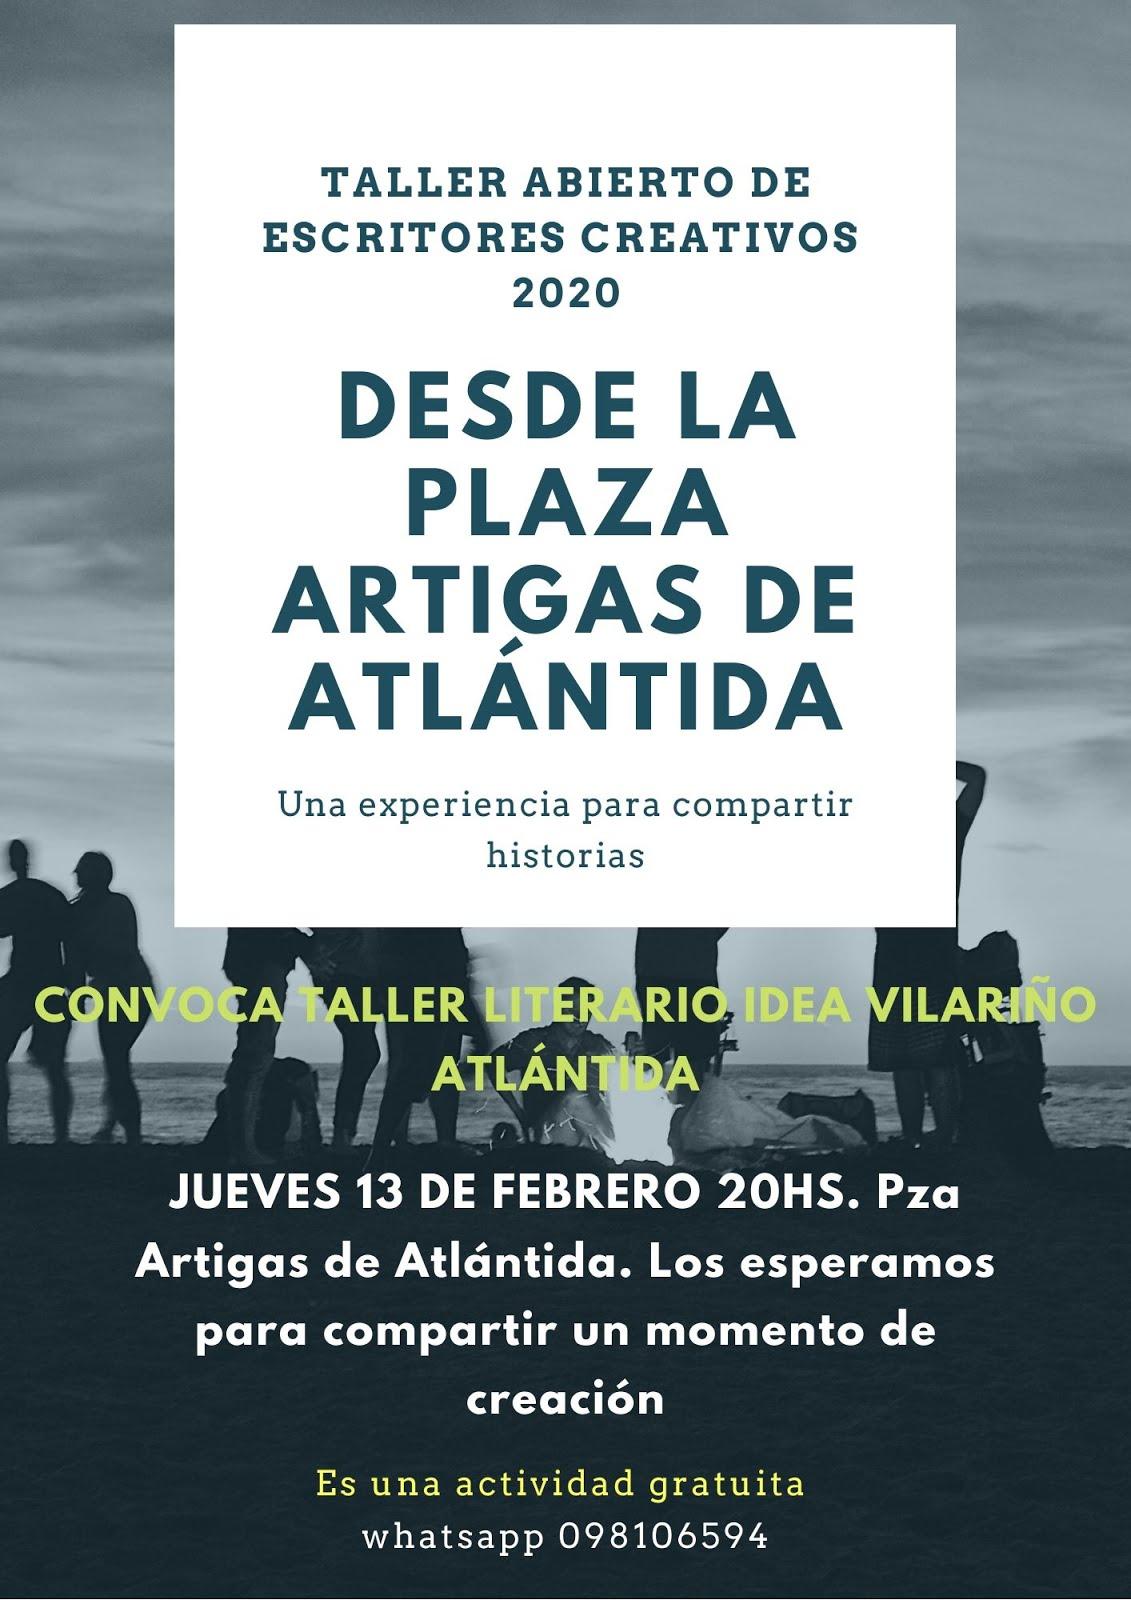 TALLER ABIERTO EN ATLÁNTIDA